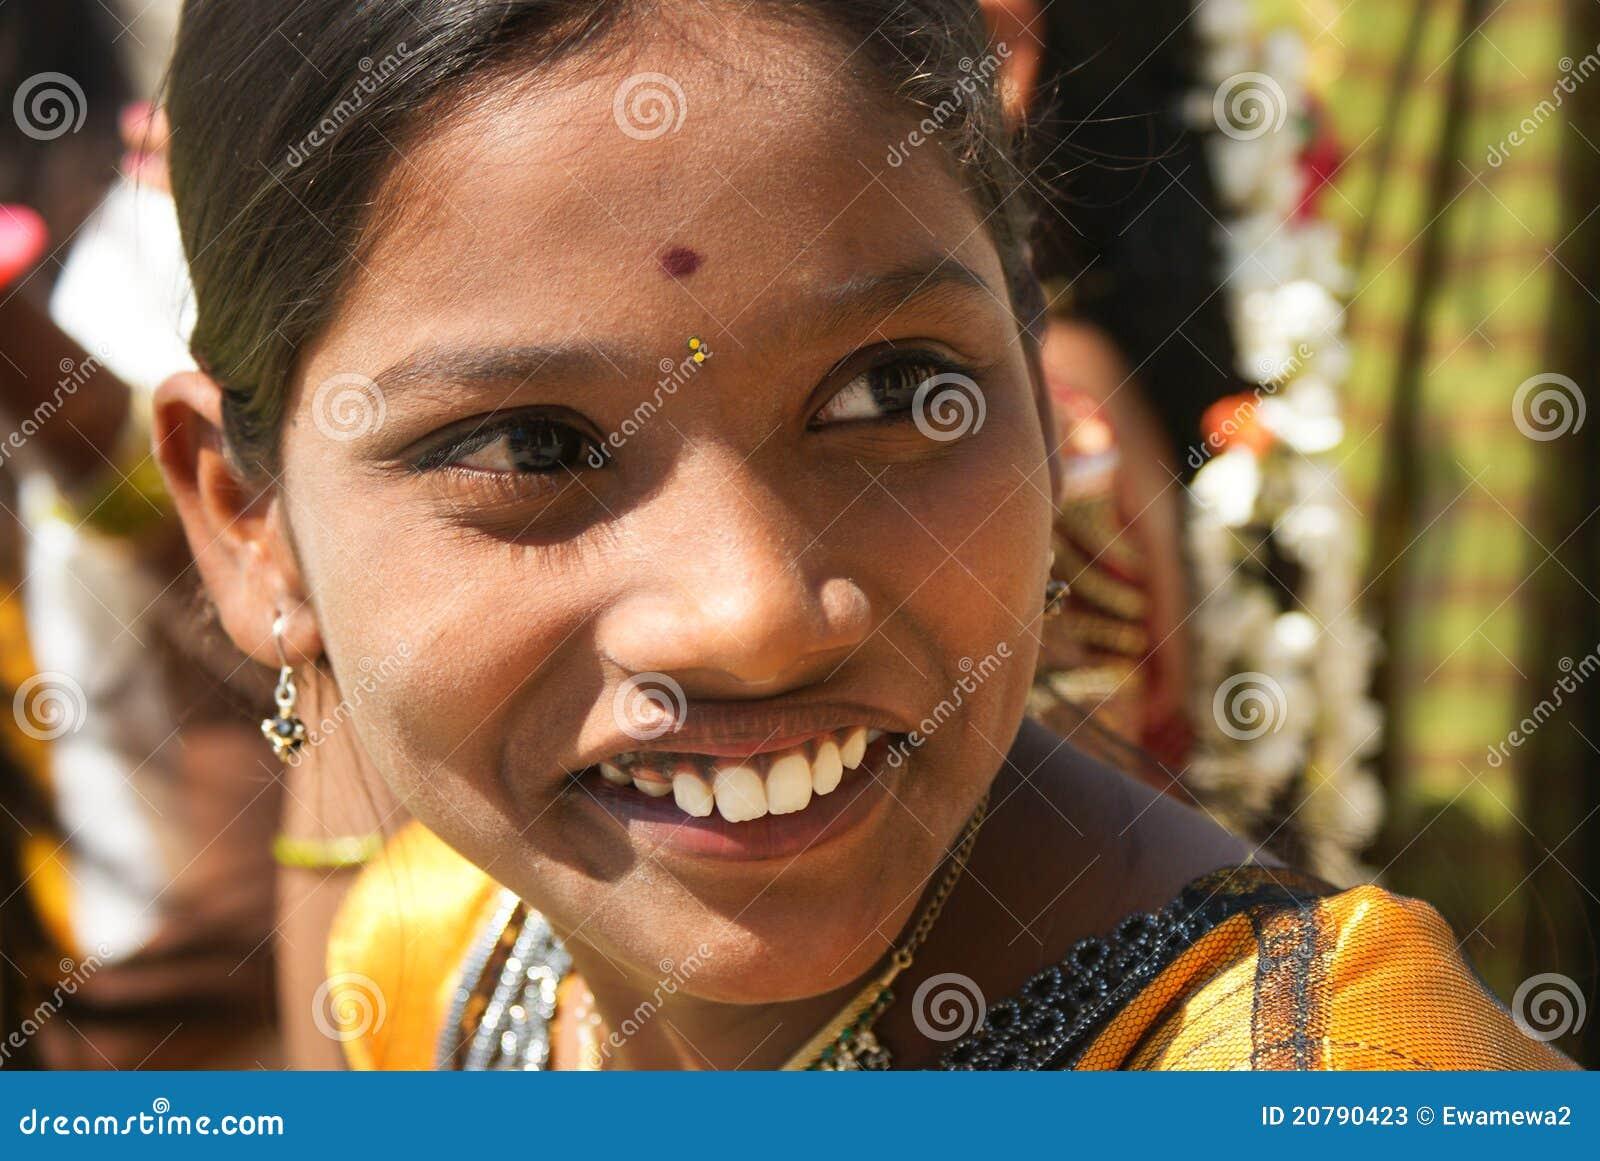 Beautiful Girl Of India Editorial Stock Photo Image Of -7959